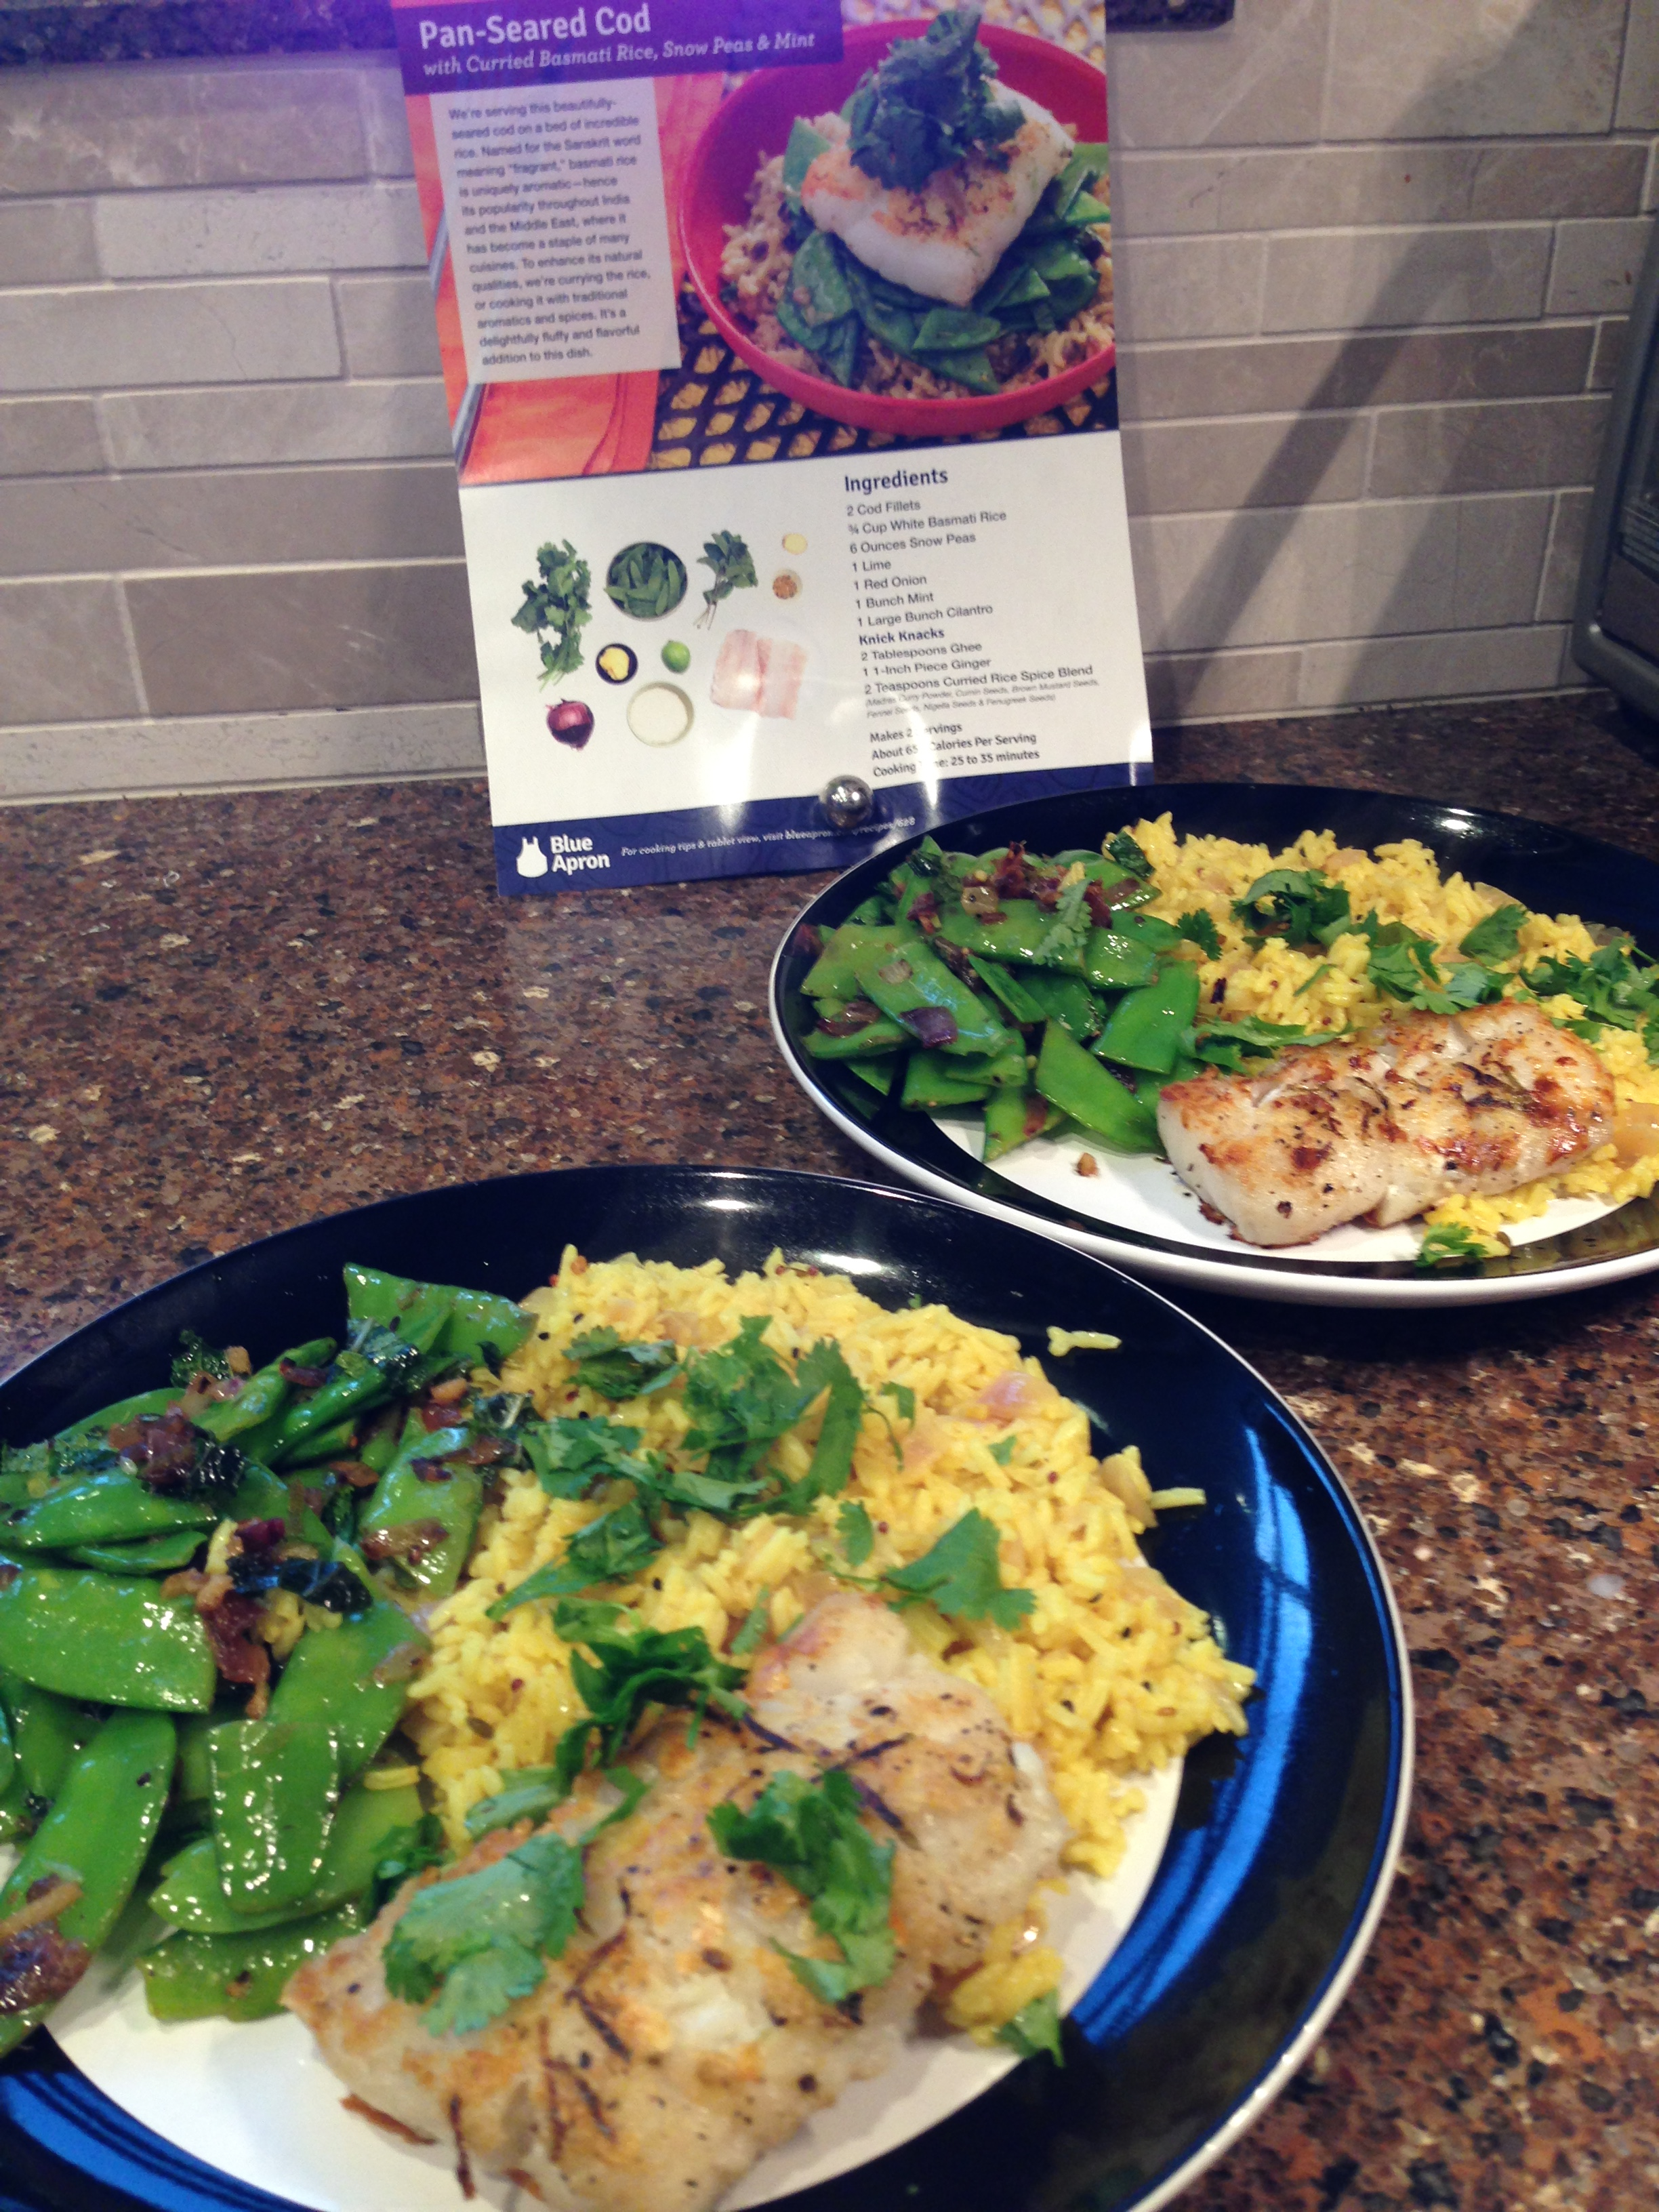 Blue apron yuzu cod - Week7meal1 Pan Seared Cod2